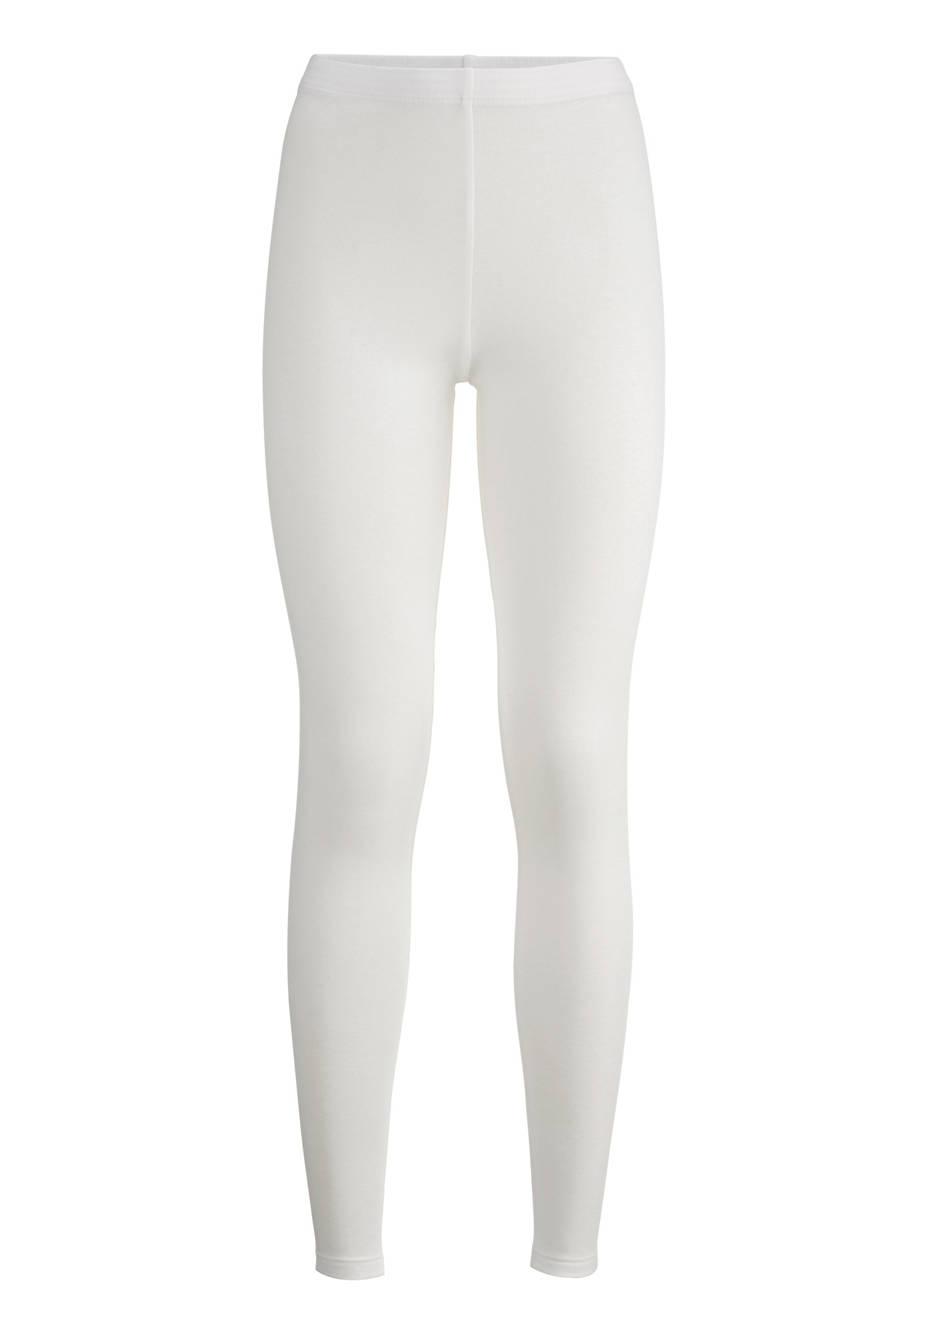 Damen Leggings aus Bio-Baumwolle